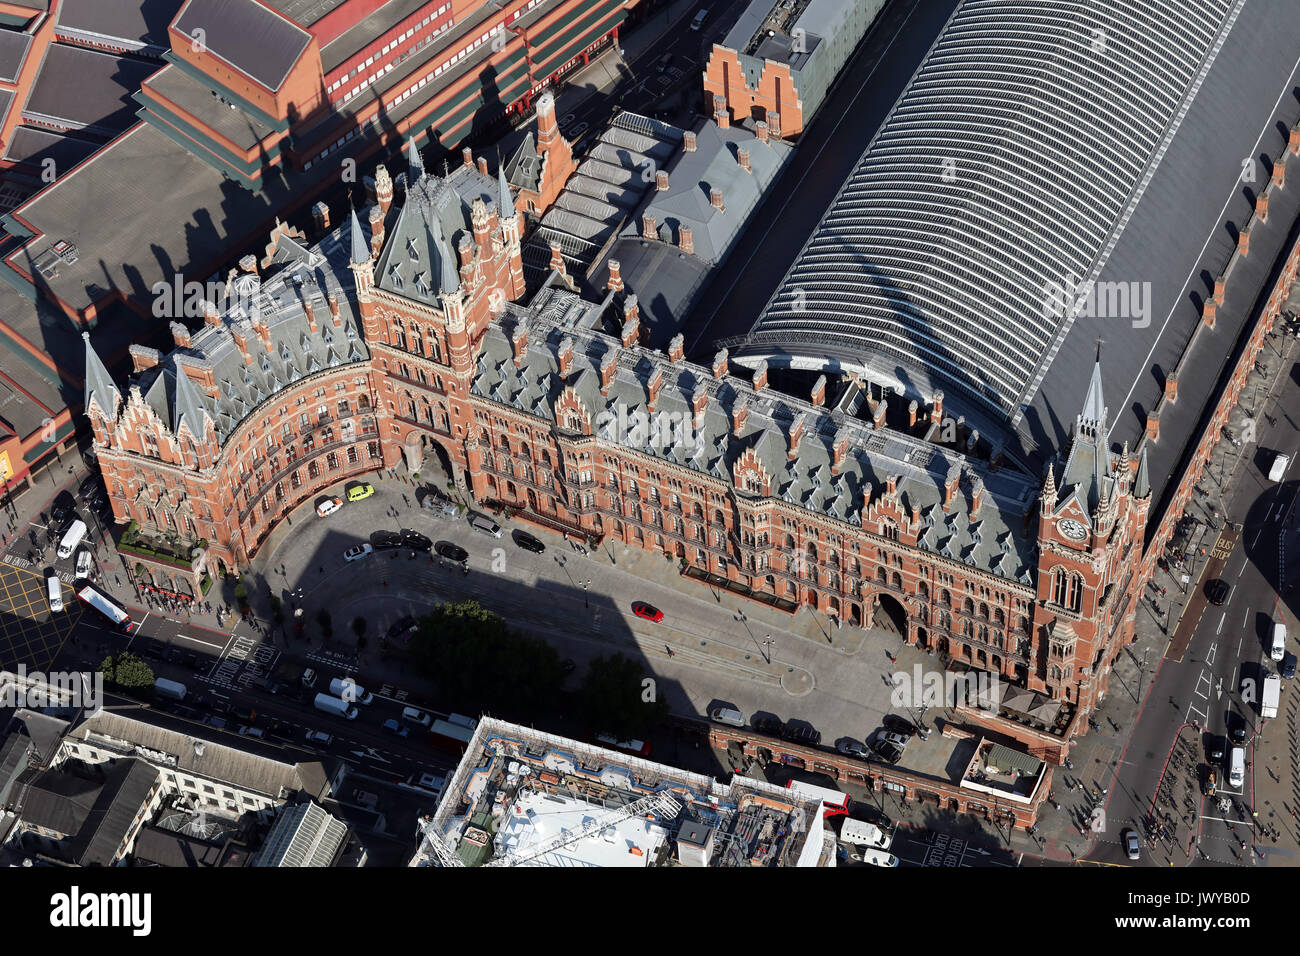 aerial view of St Pancras International Station, London, UK - Stock Image